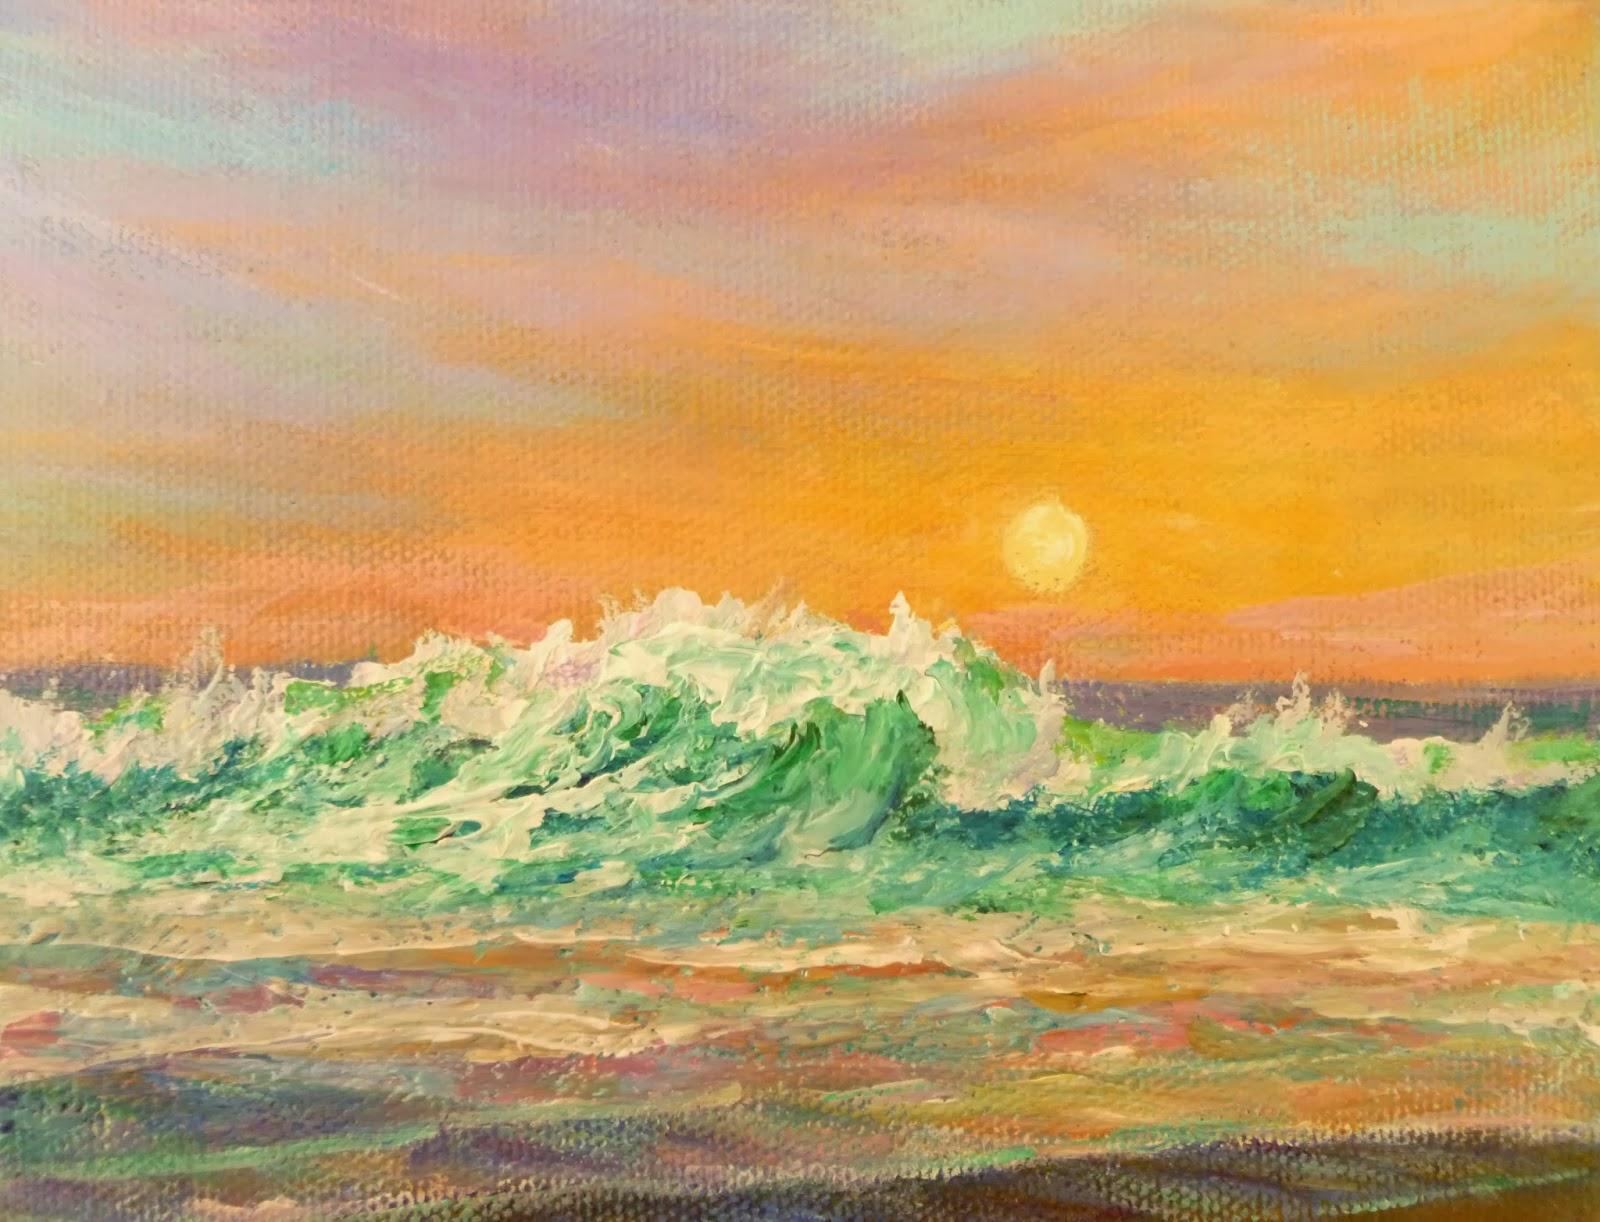 Coastal Decor Painting of an ocean sunset